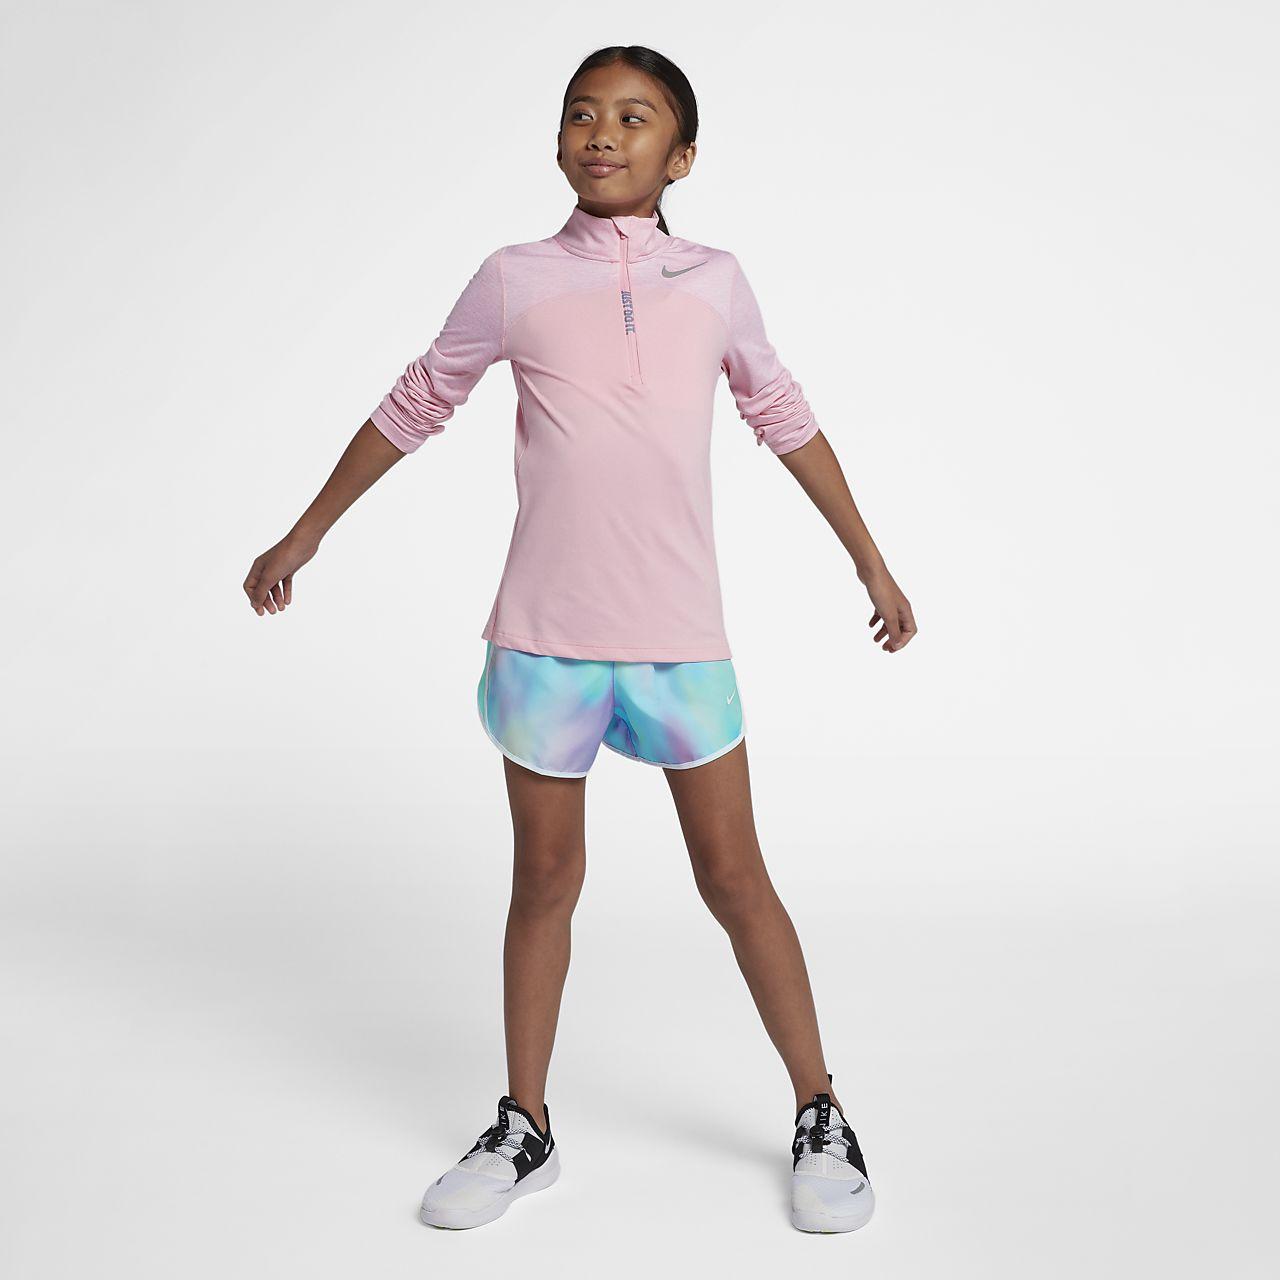 dfa9c6c7b Nike Tempo Older Kids' (Girls') Printed Running Shorts. Nike.com VN